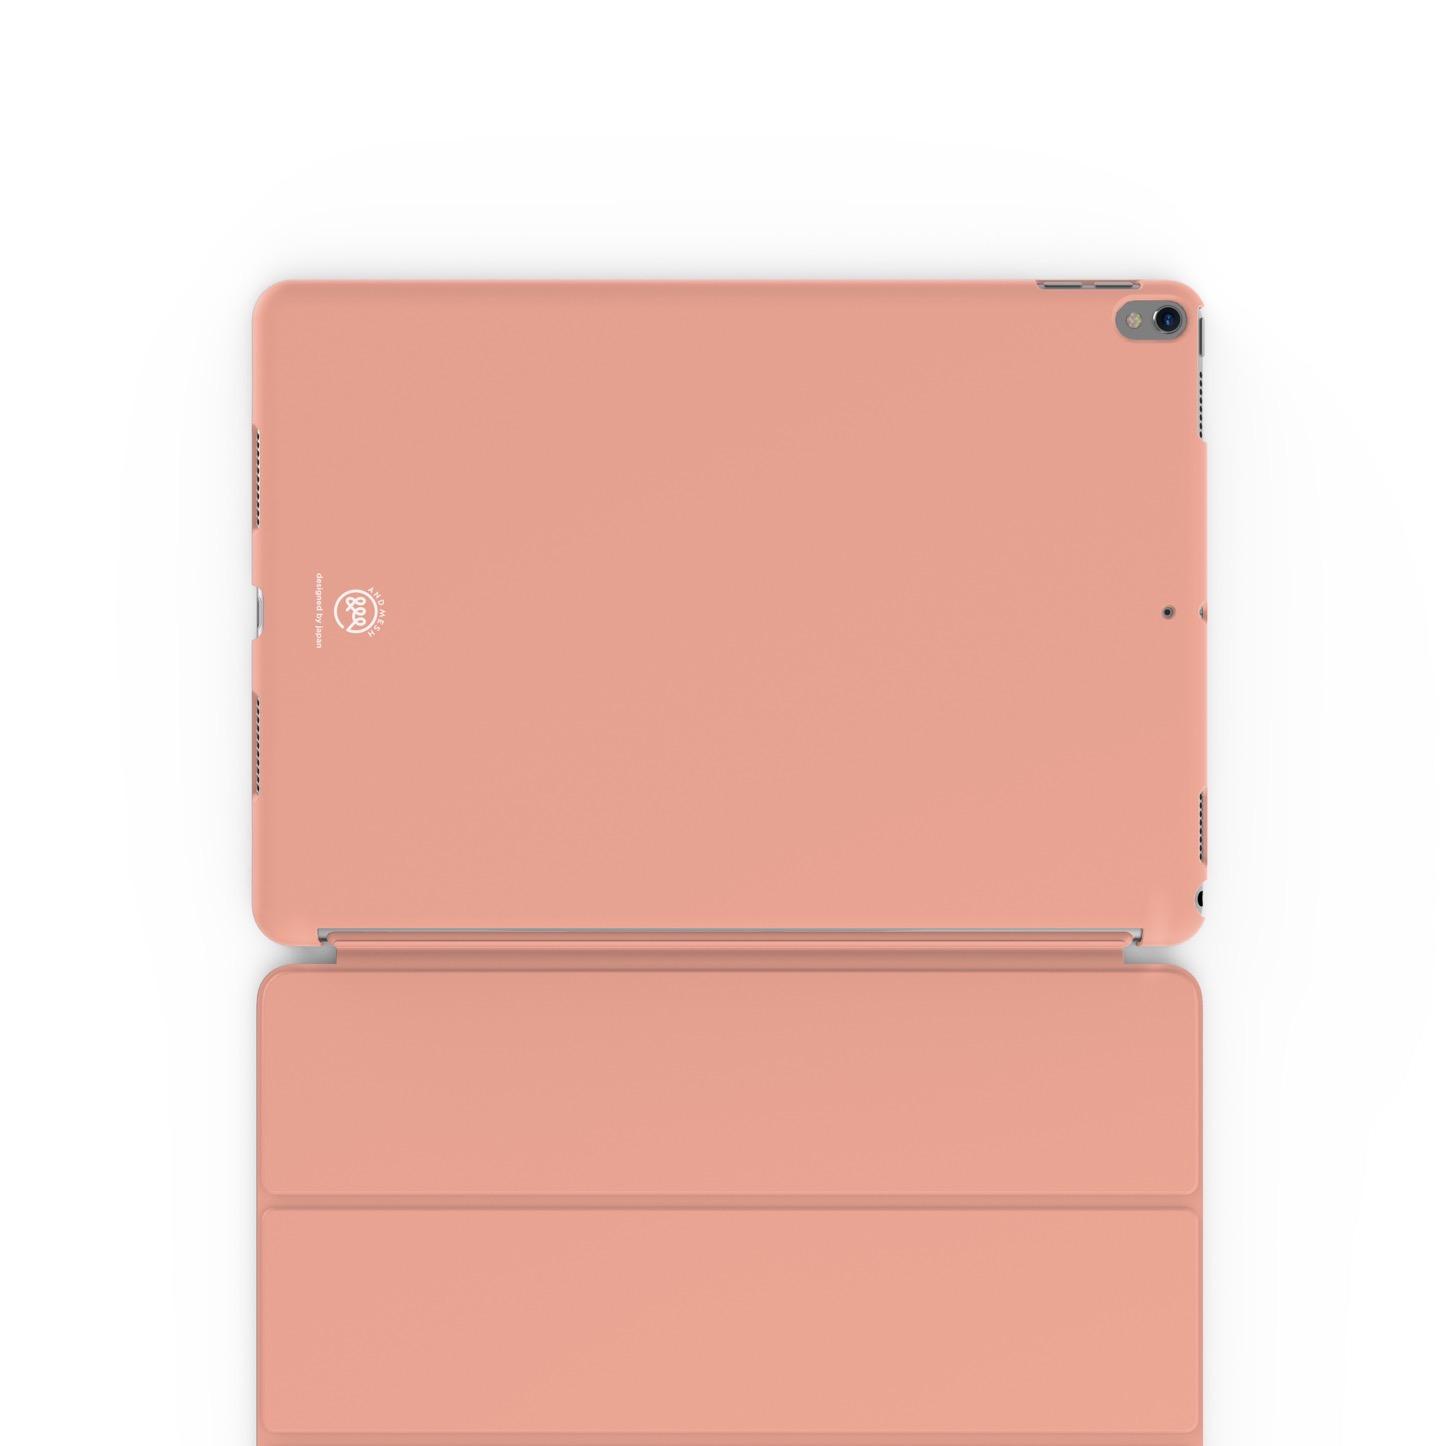 AndMesh-iPad-Pro-10_5-06.jpg